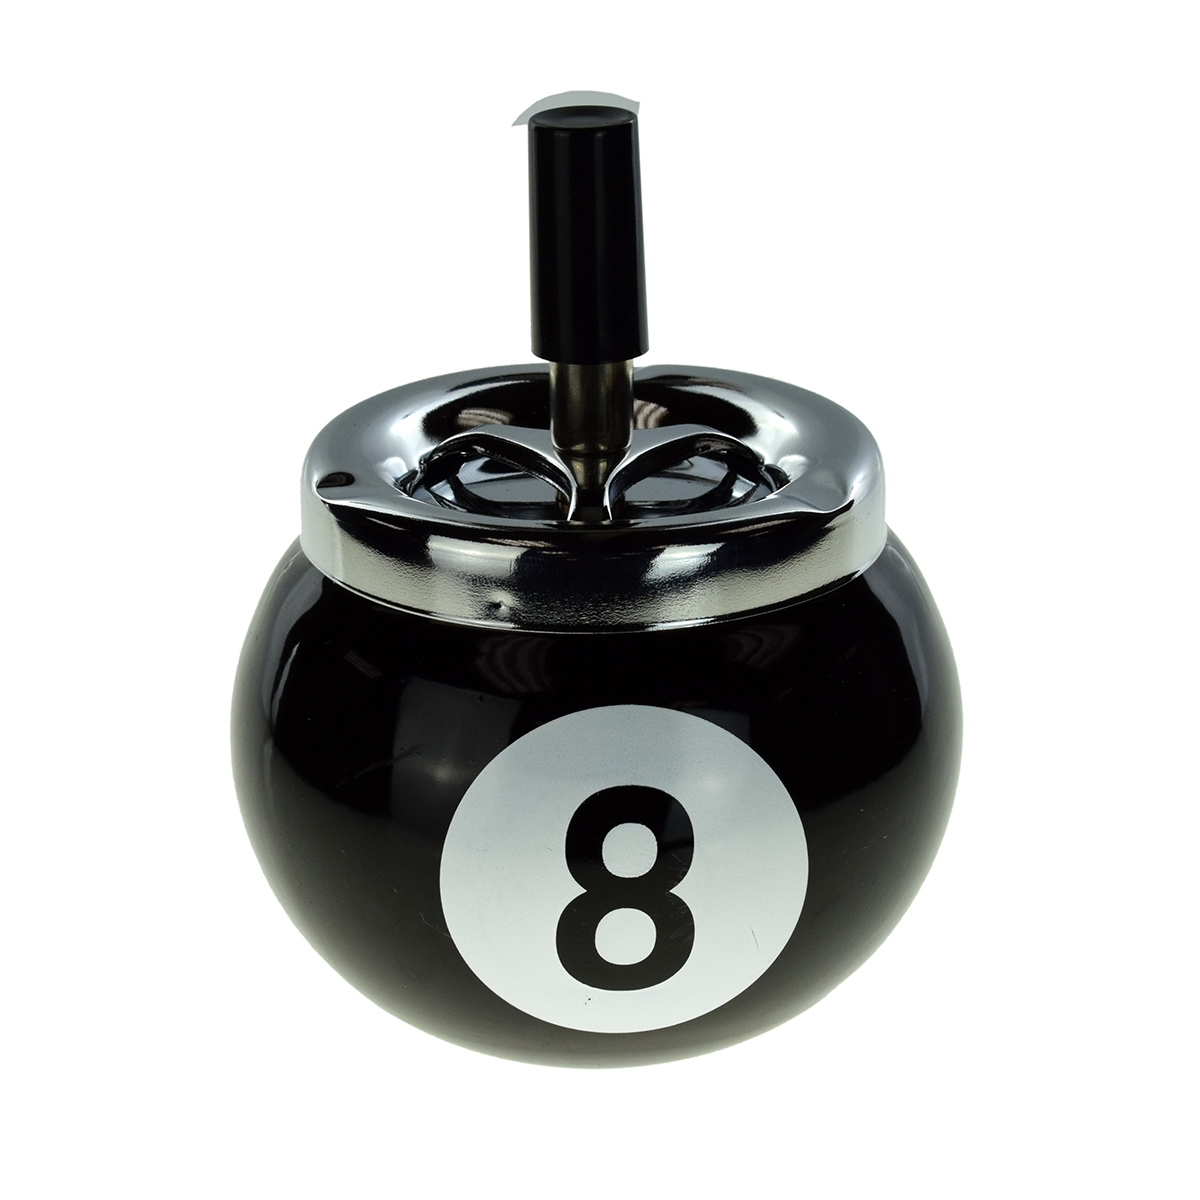 8 Ball Metal Spinning Ashtray Boxed 1